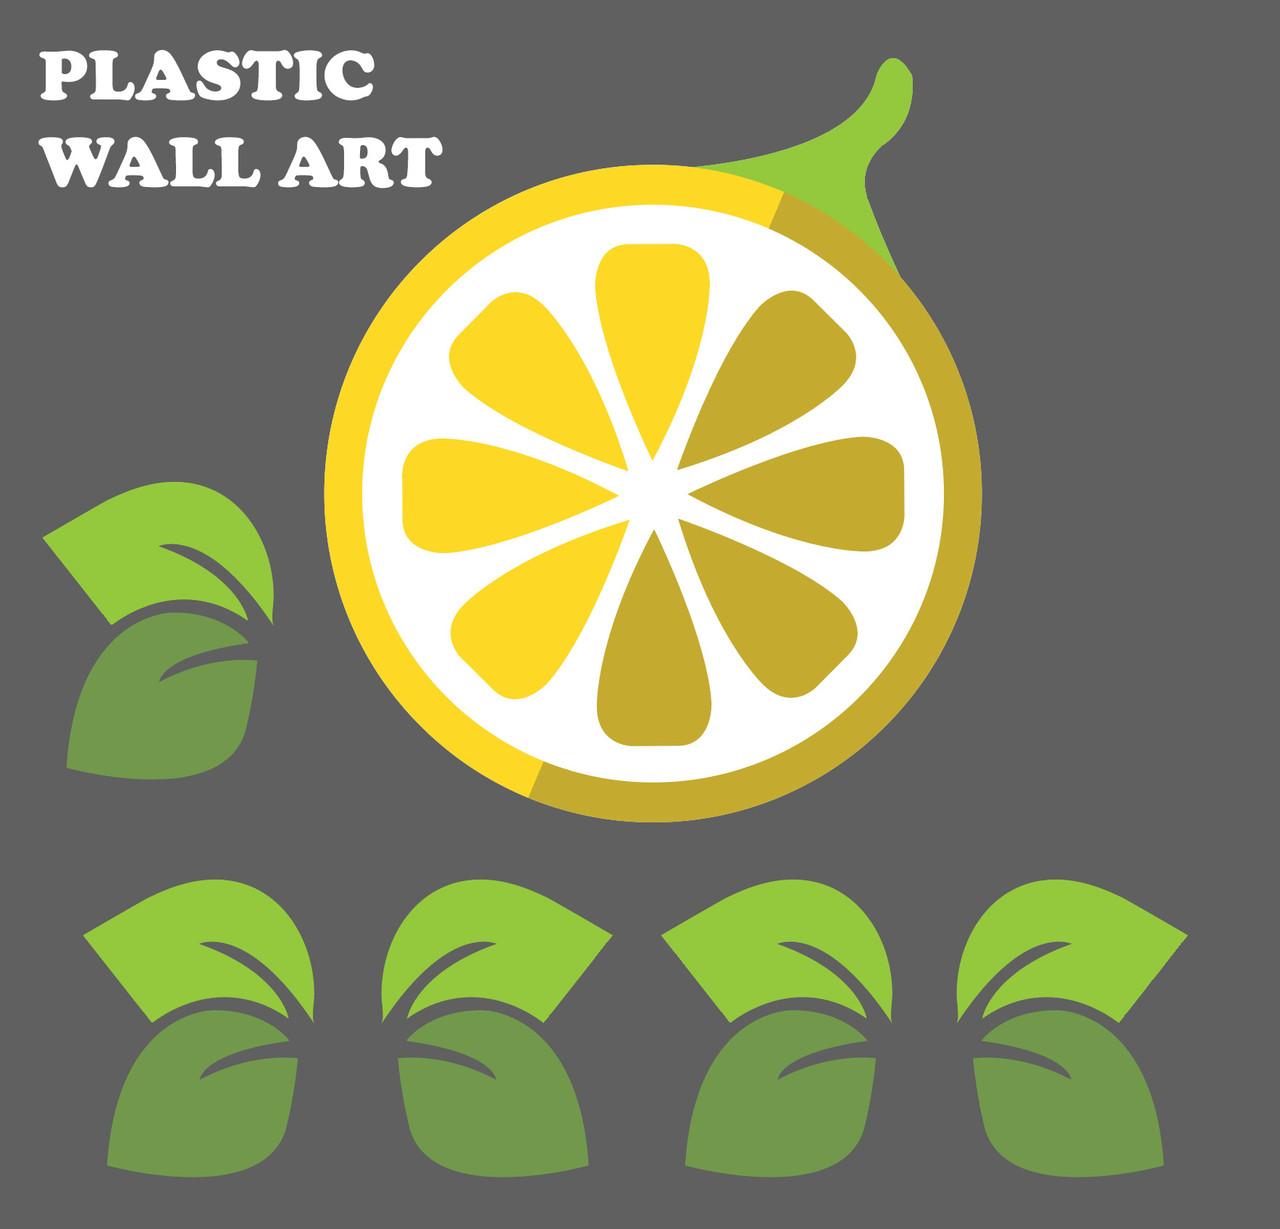 Large LemonTree Styrene (Plastic) Wall Art Set